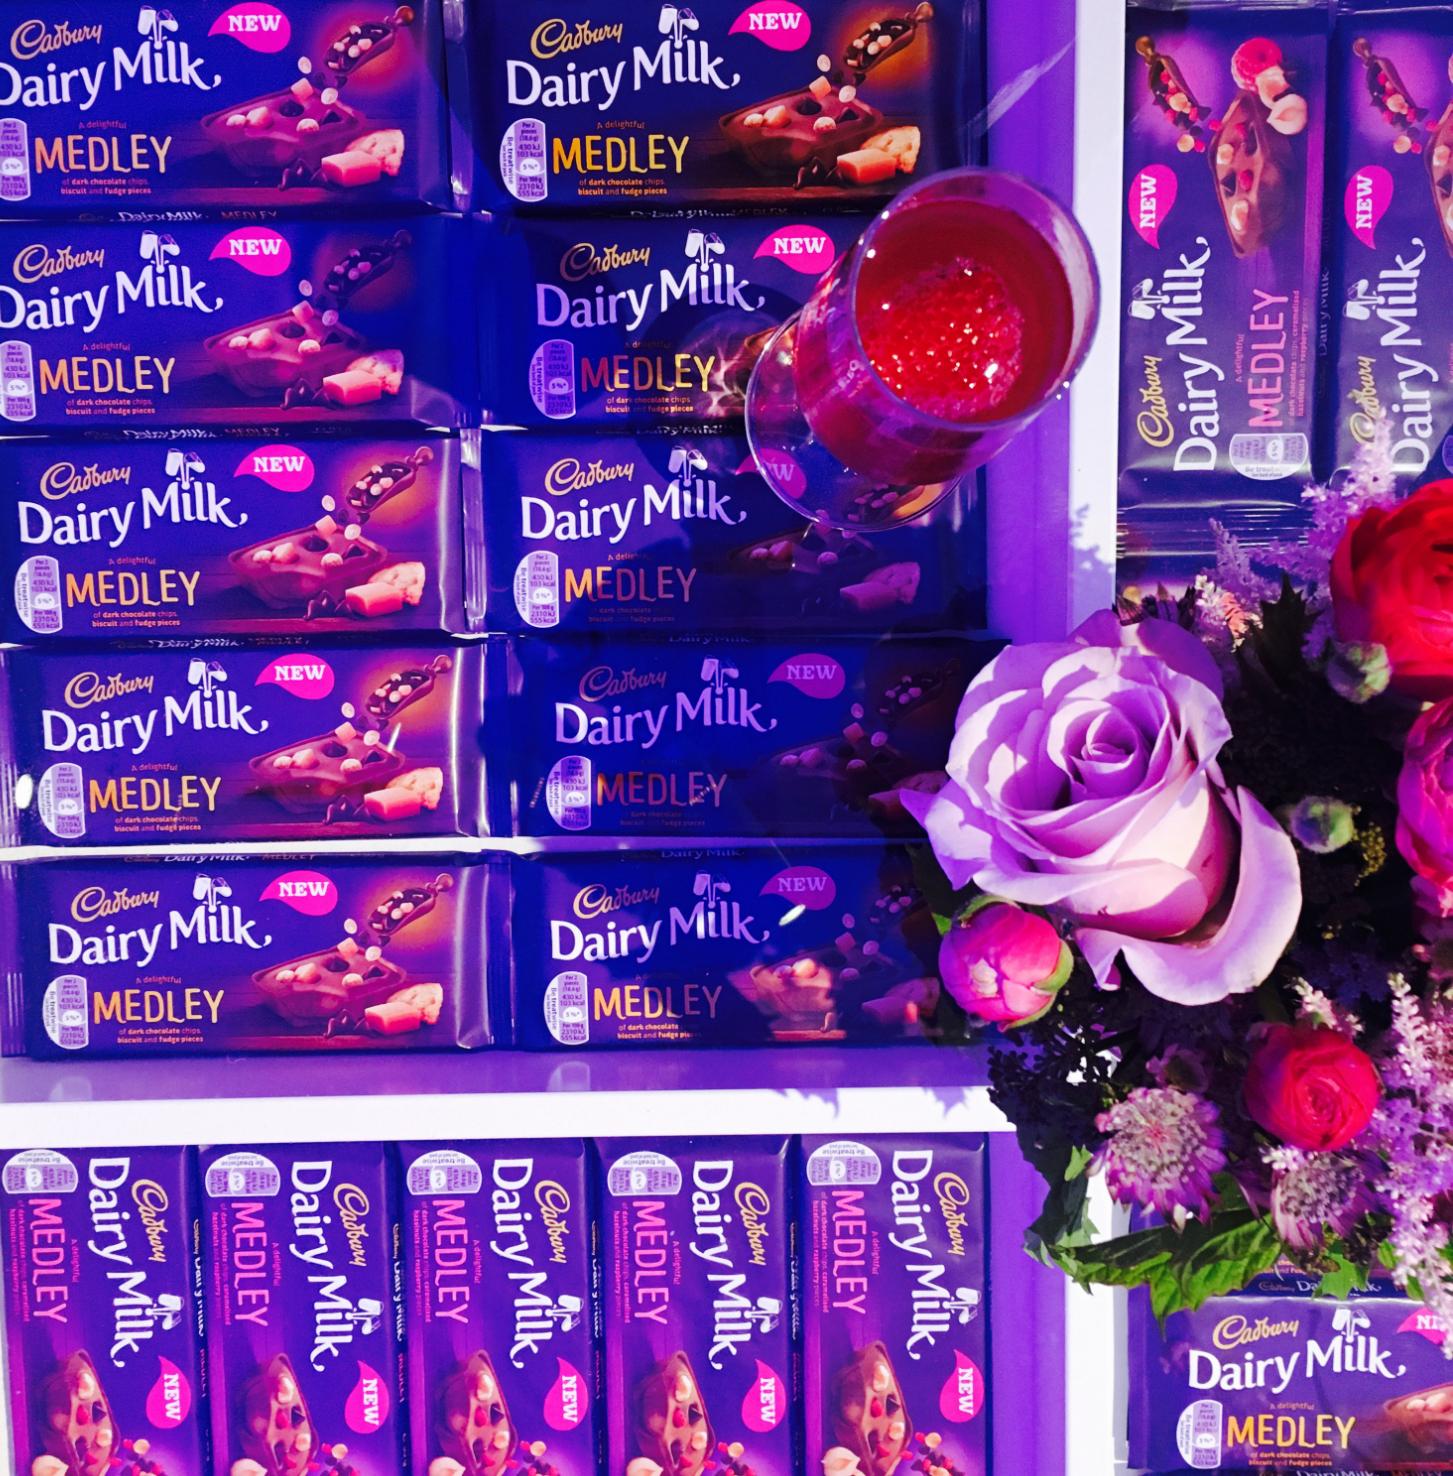 Lifestyle Cadbury Dairy Milk Medleys Beauty Lounge Katie Snooks